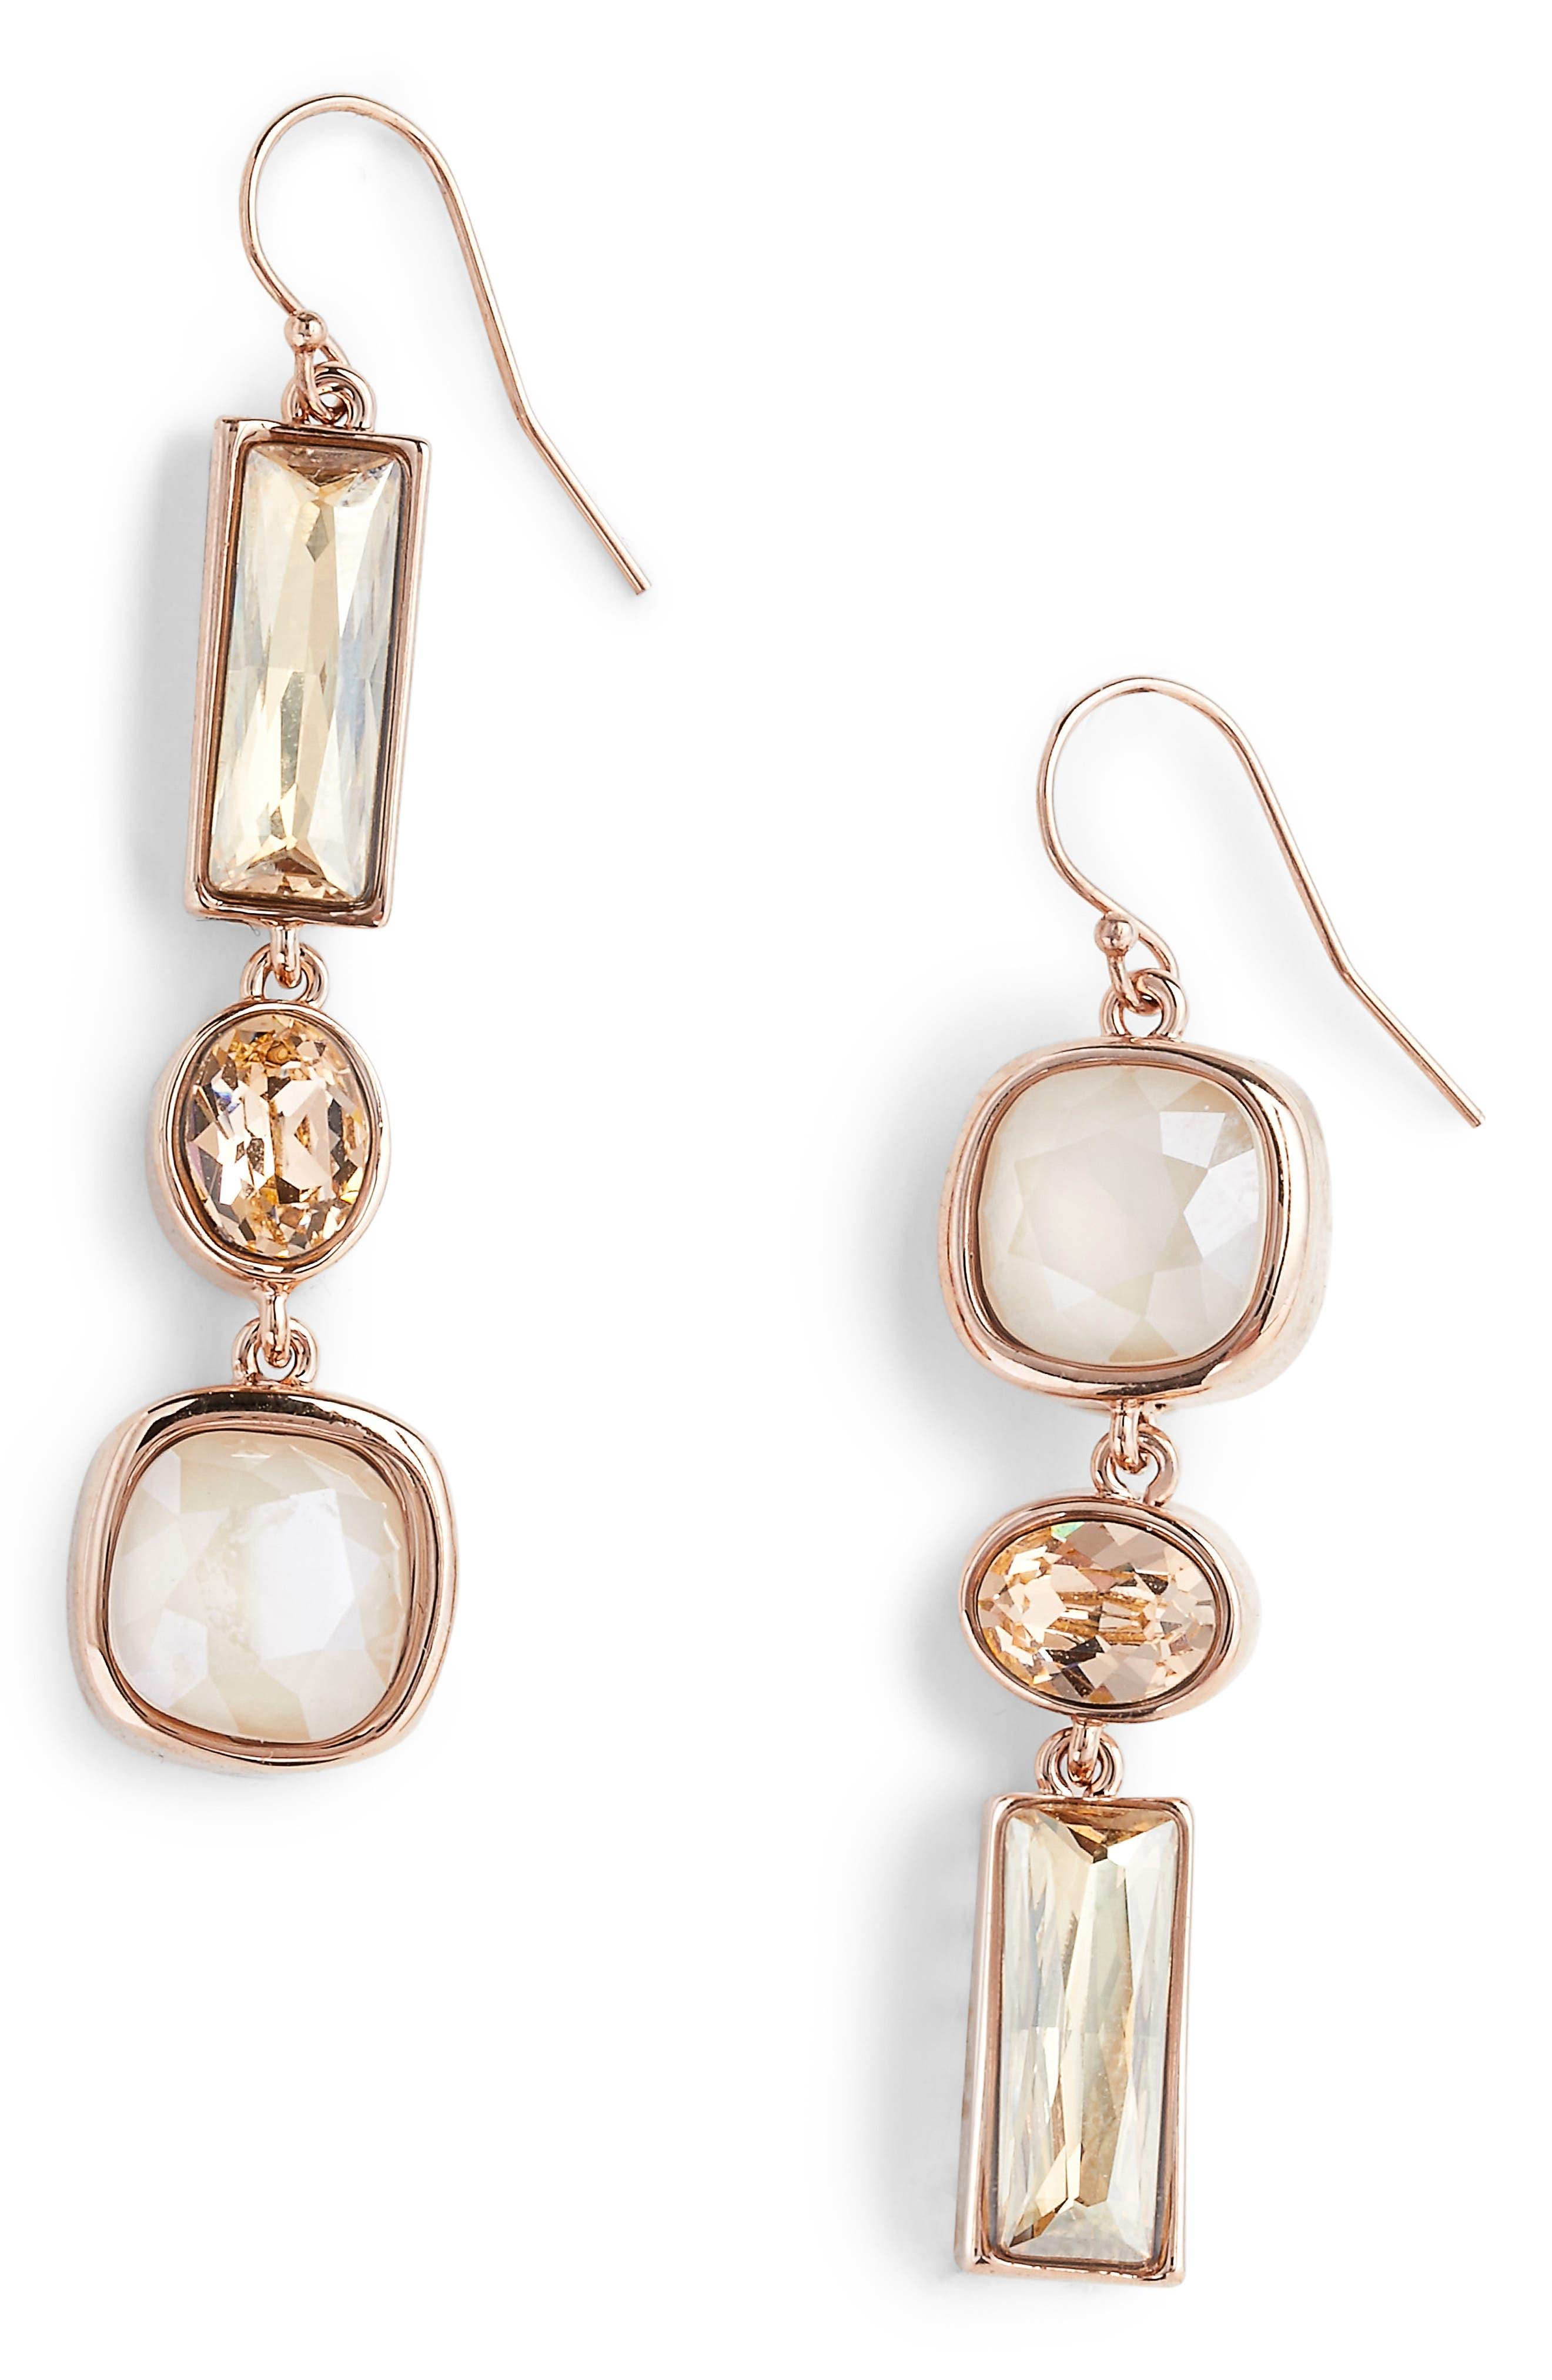 Swarovski Crystal Drop Earrings,                         Main,                         color, Crystal Ivory Cream/ Peach